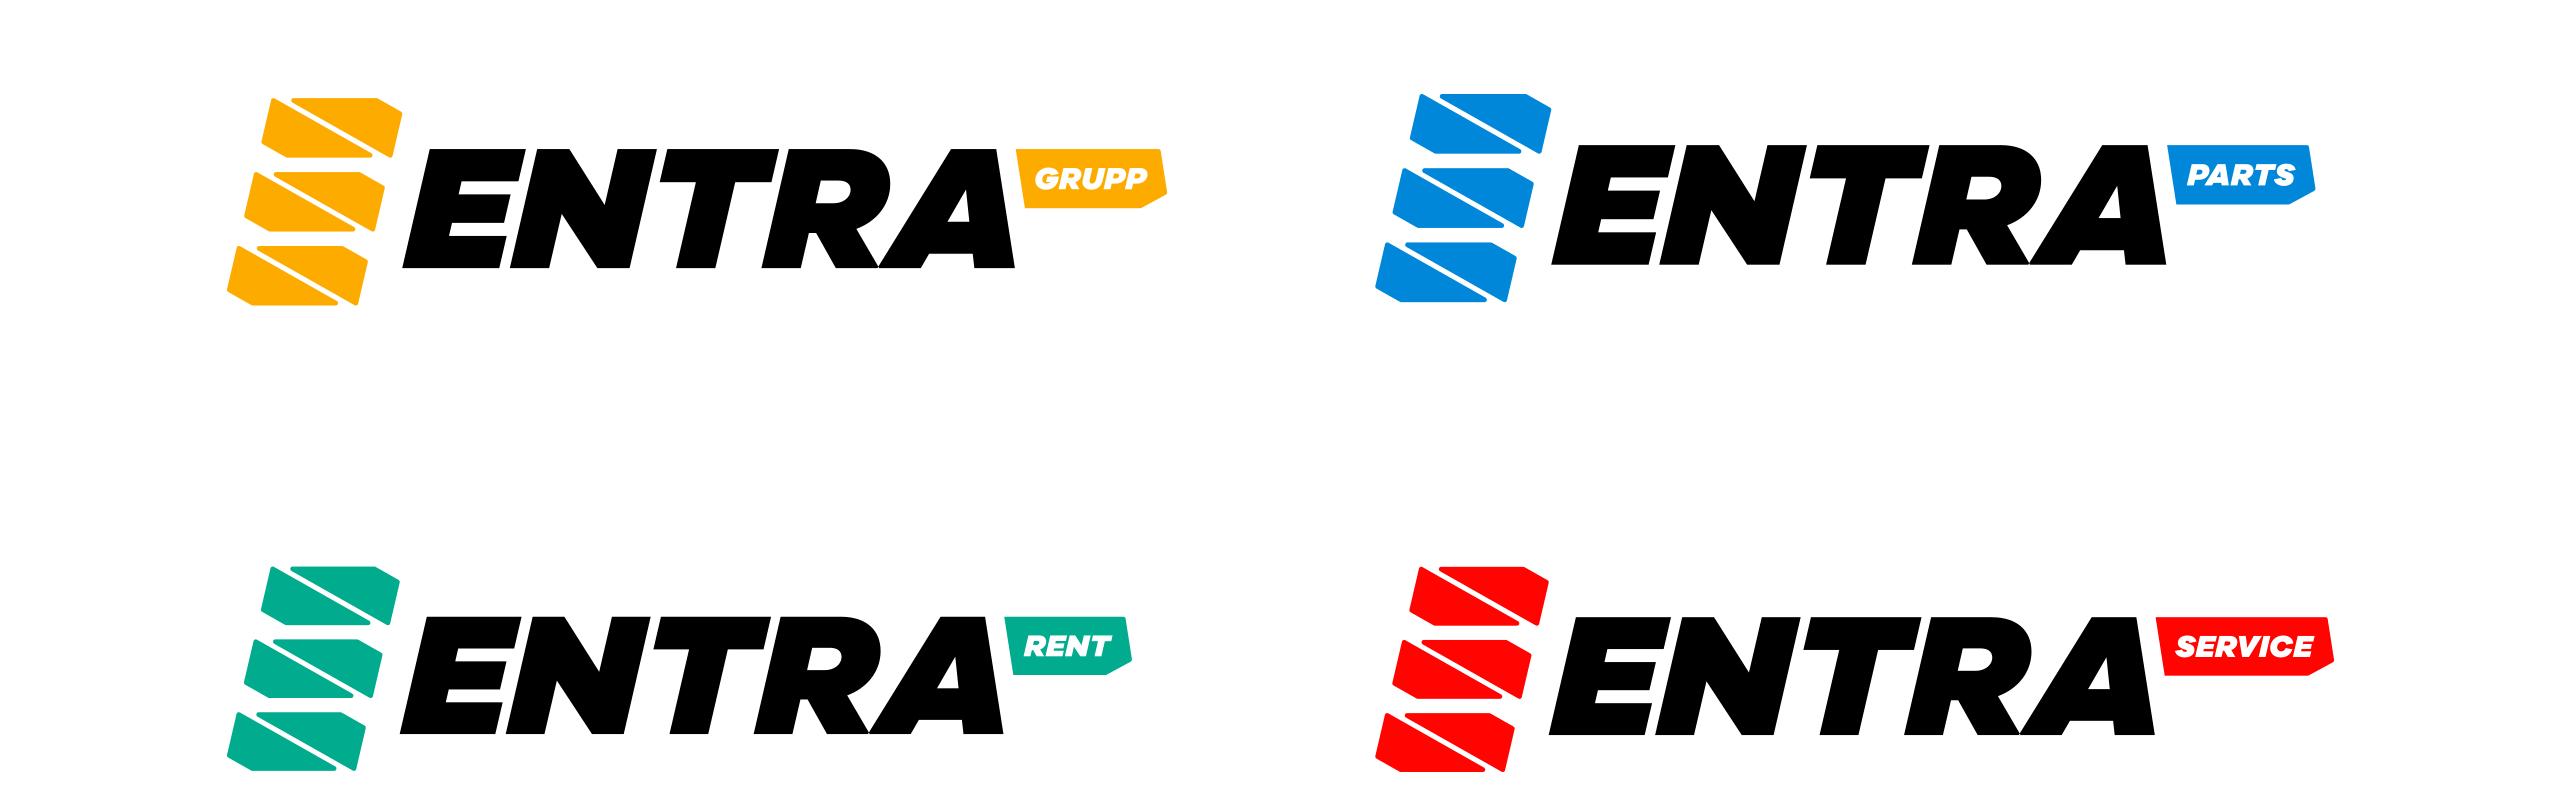 Entra Logotype